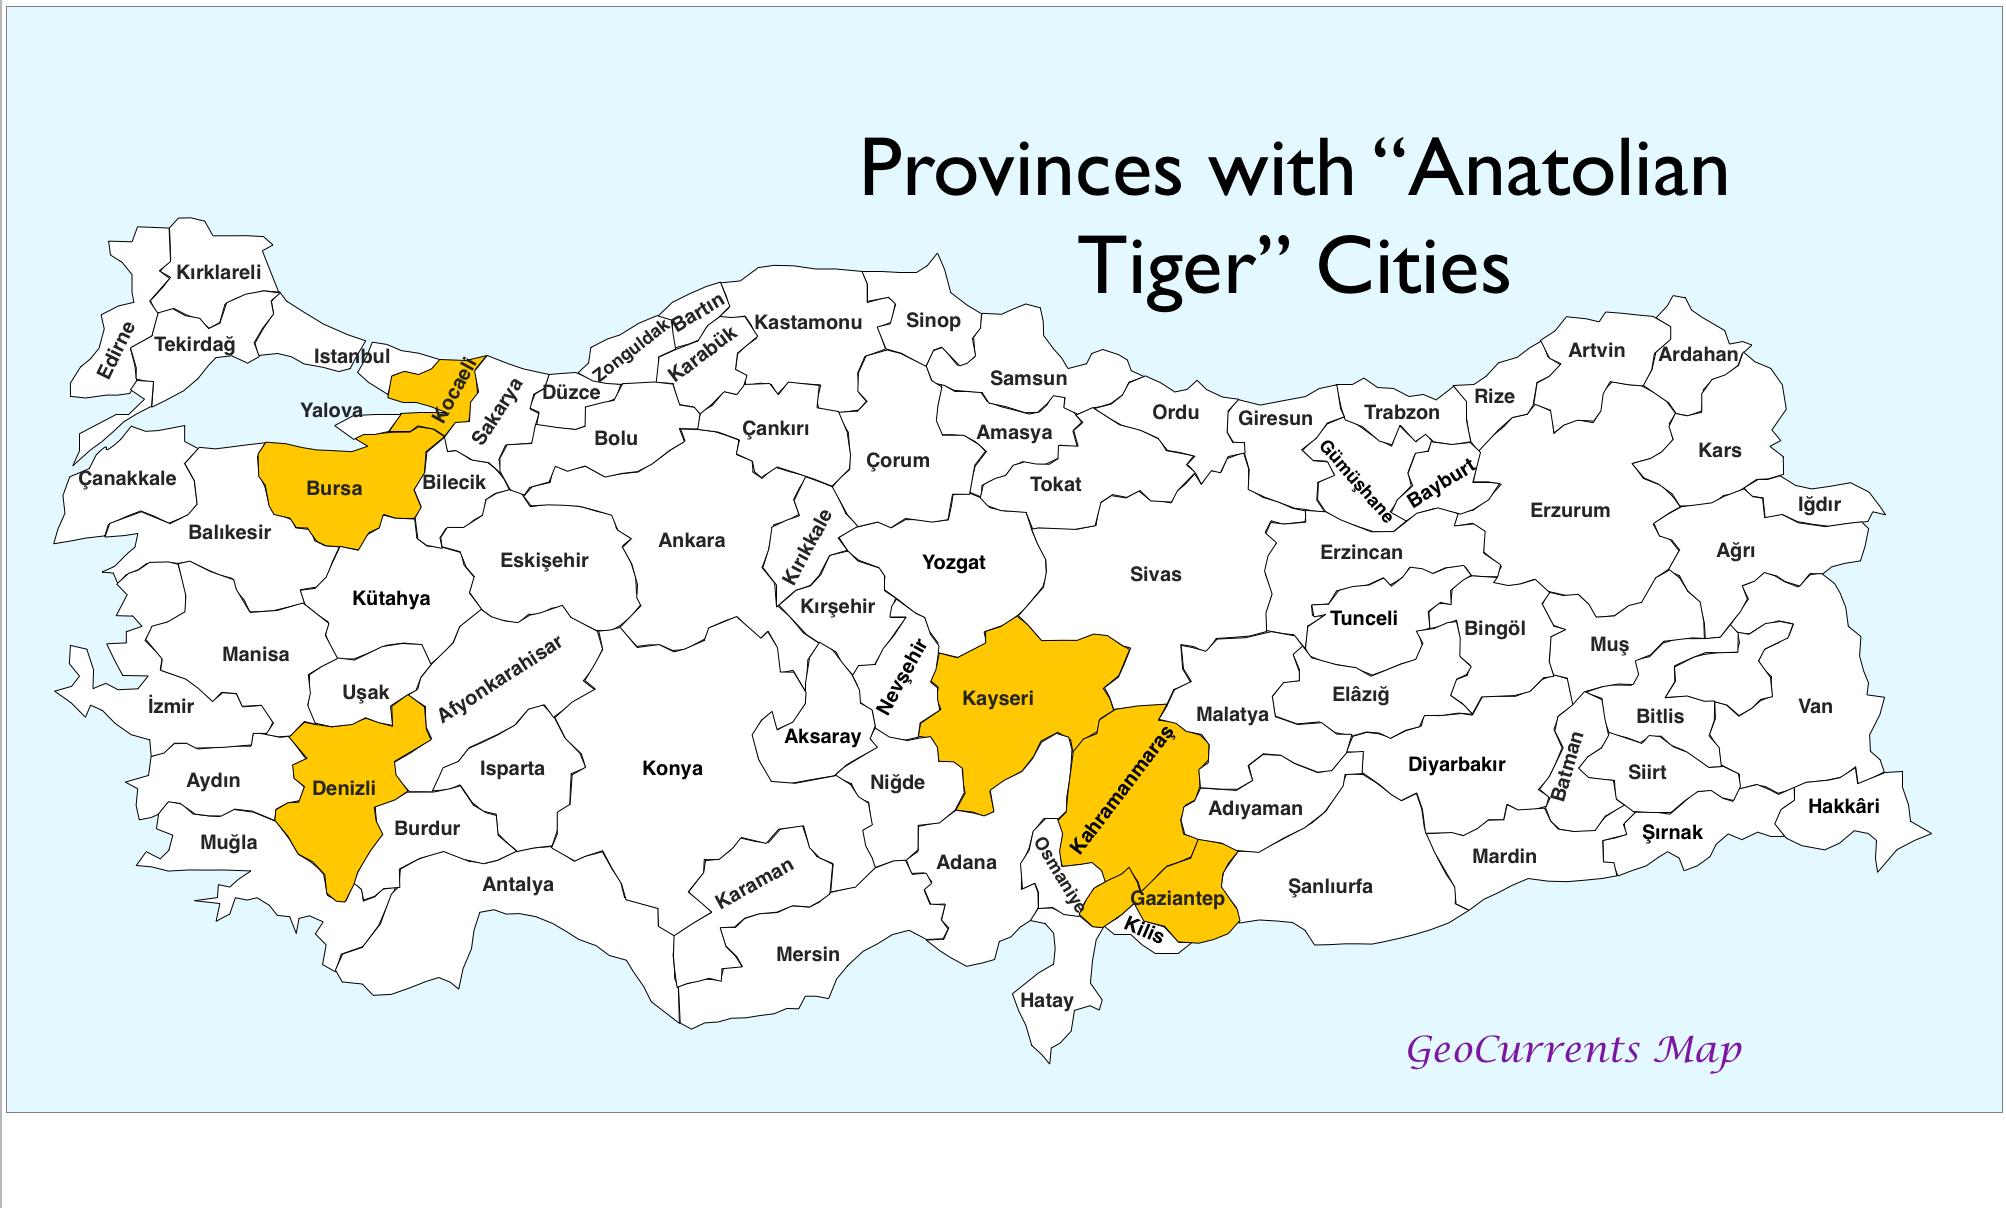 GeoCurrents Maps of Turkey GeoCurrents